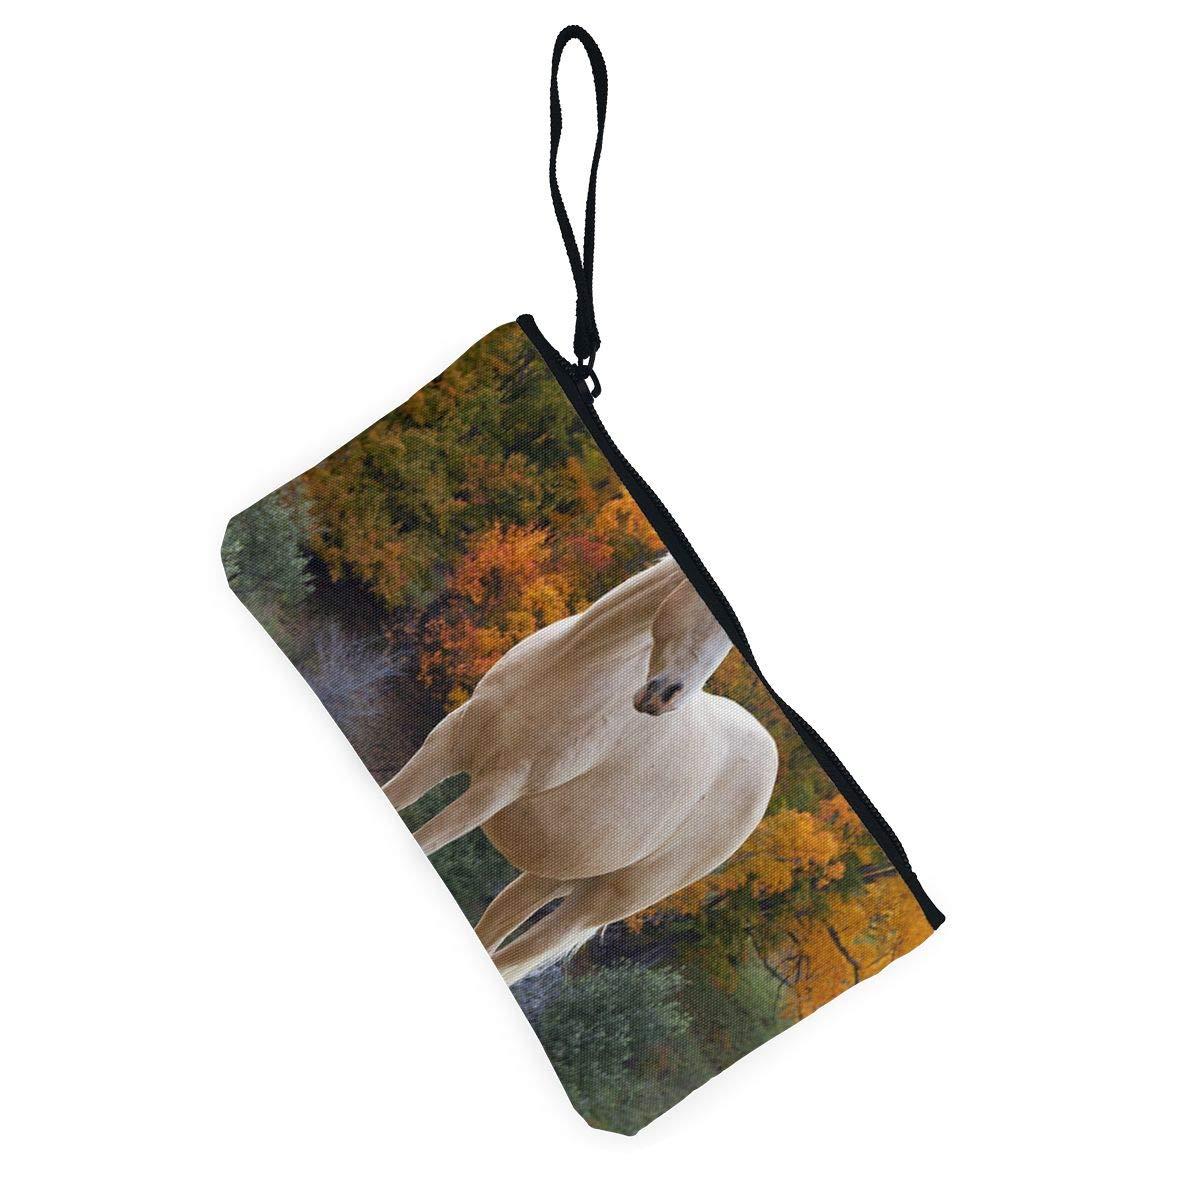 Coin Purse White Horse In Autumn Mens Zipper Canvas Purse Wallet TravelCustomized Case